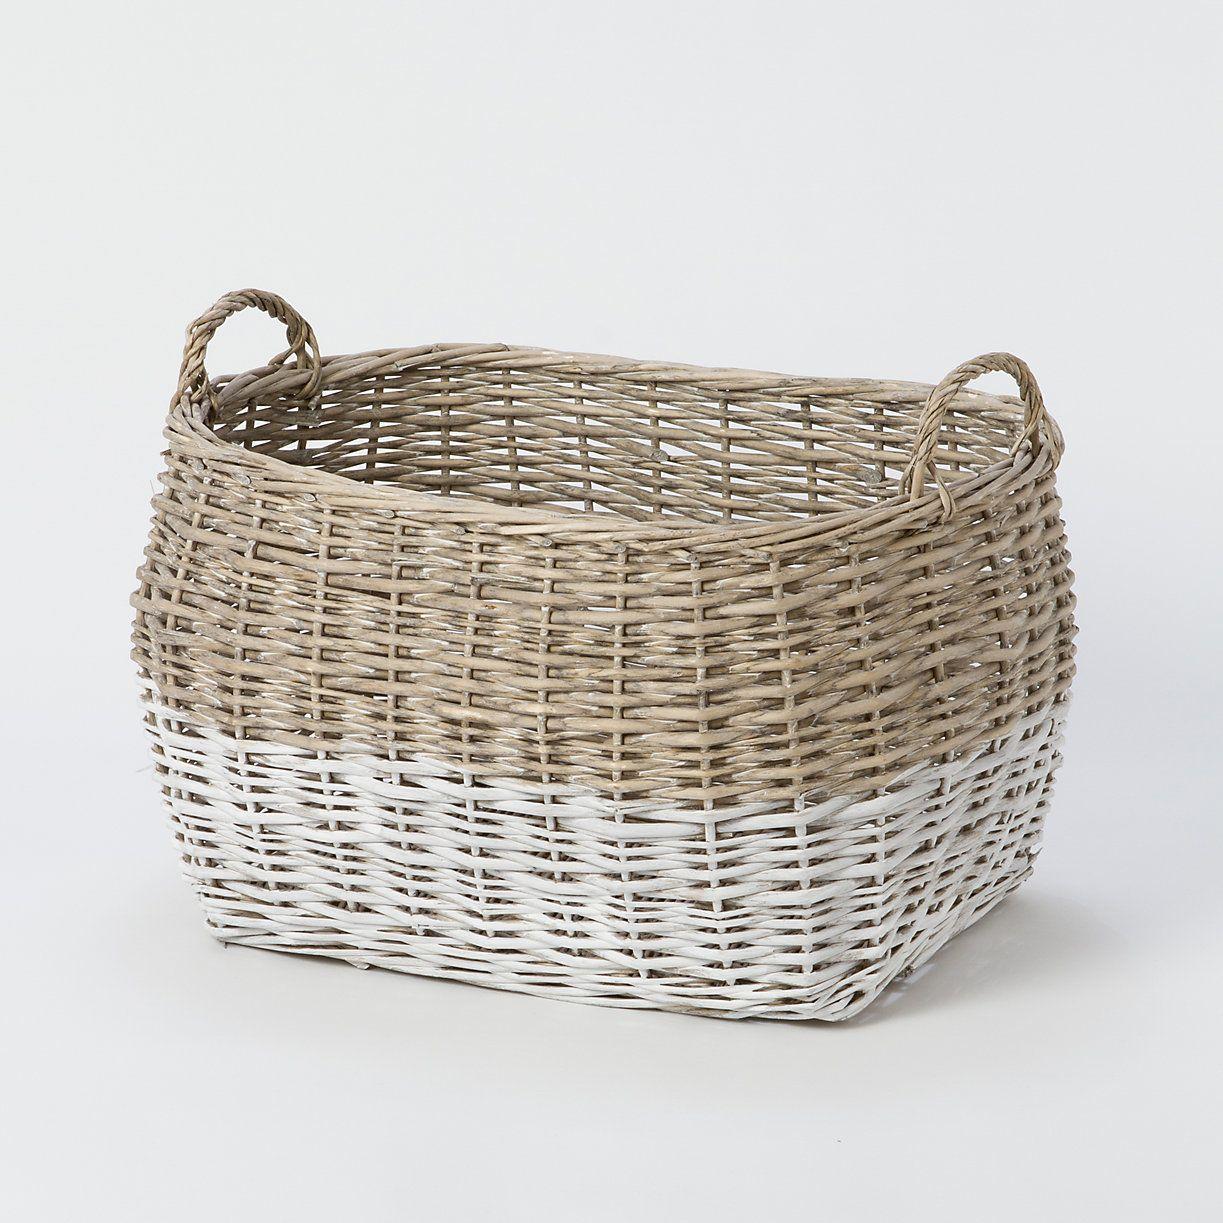 Terrain Home Decor: Colorblock Utility Basket, Large In House+Home HOME+DÉCOR